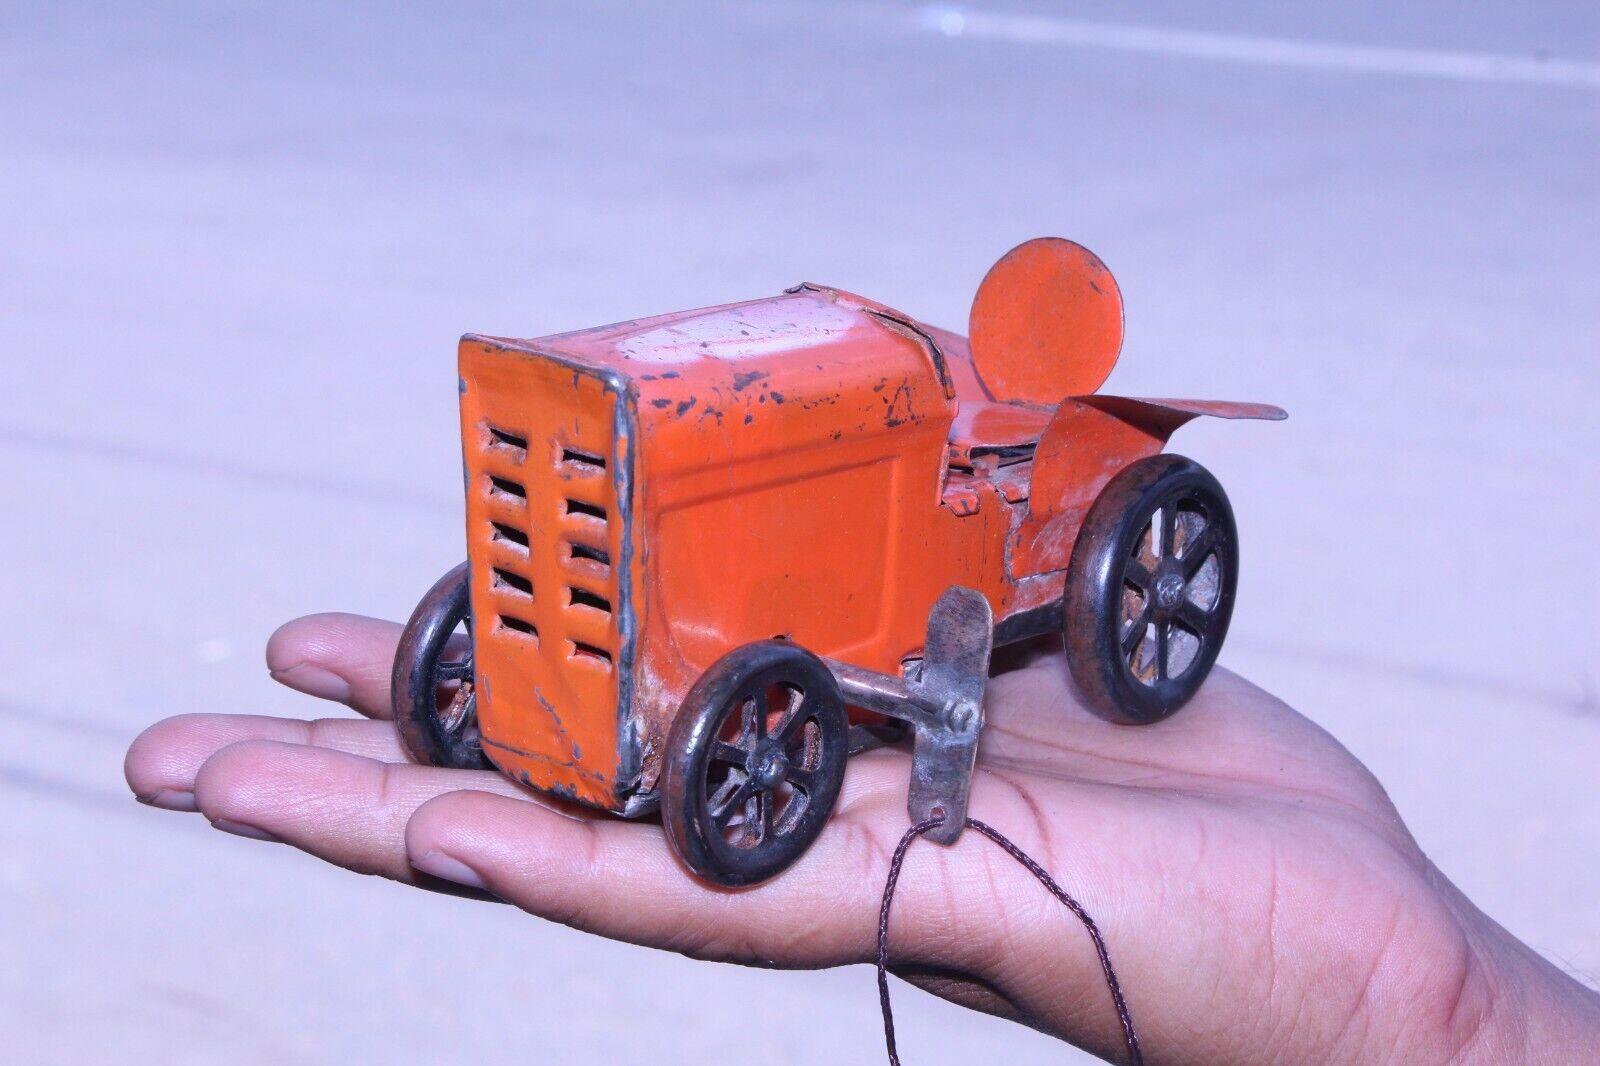 Vintage naranja Wind Up Litografía Apisonadora Juguete de estaño